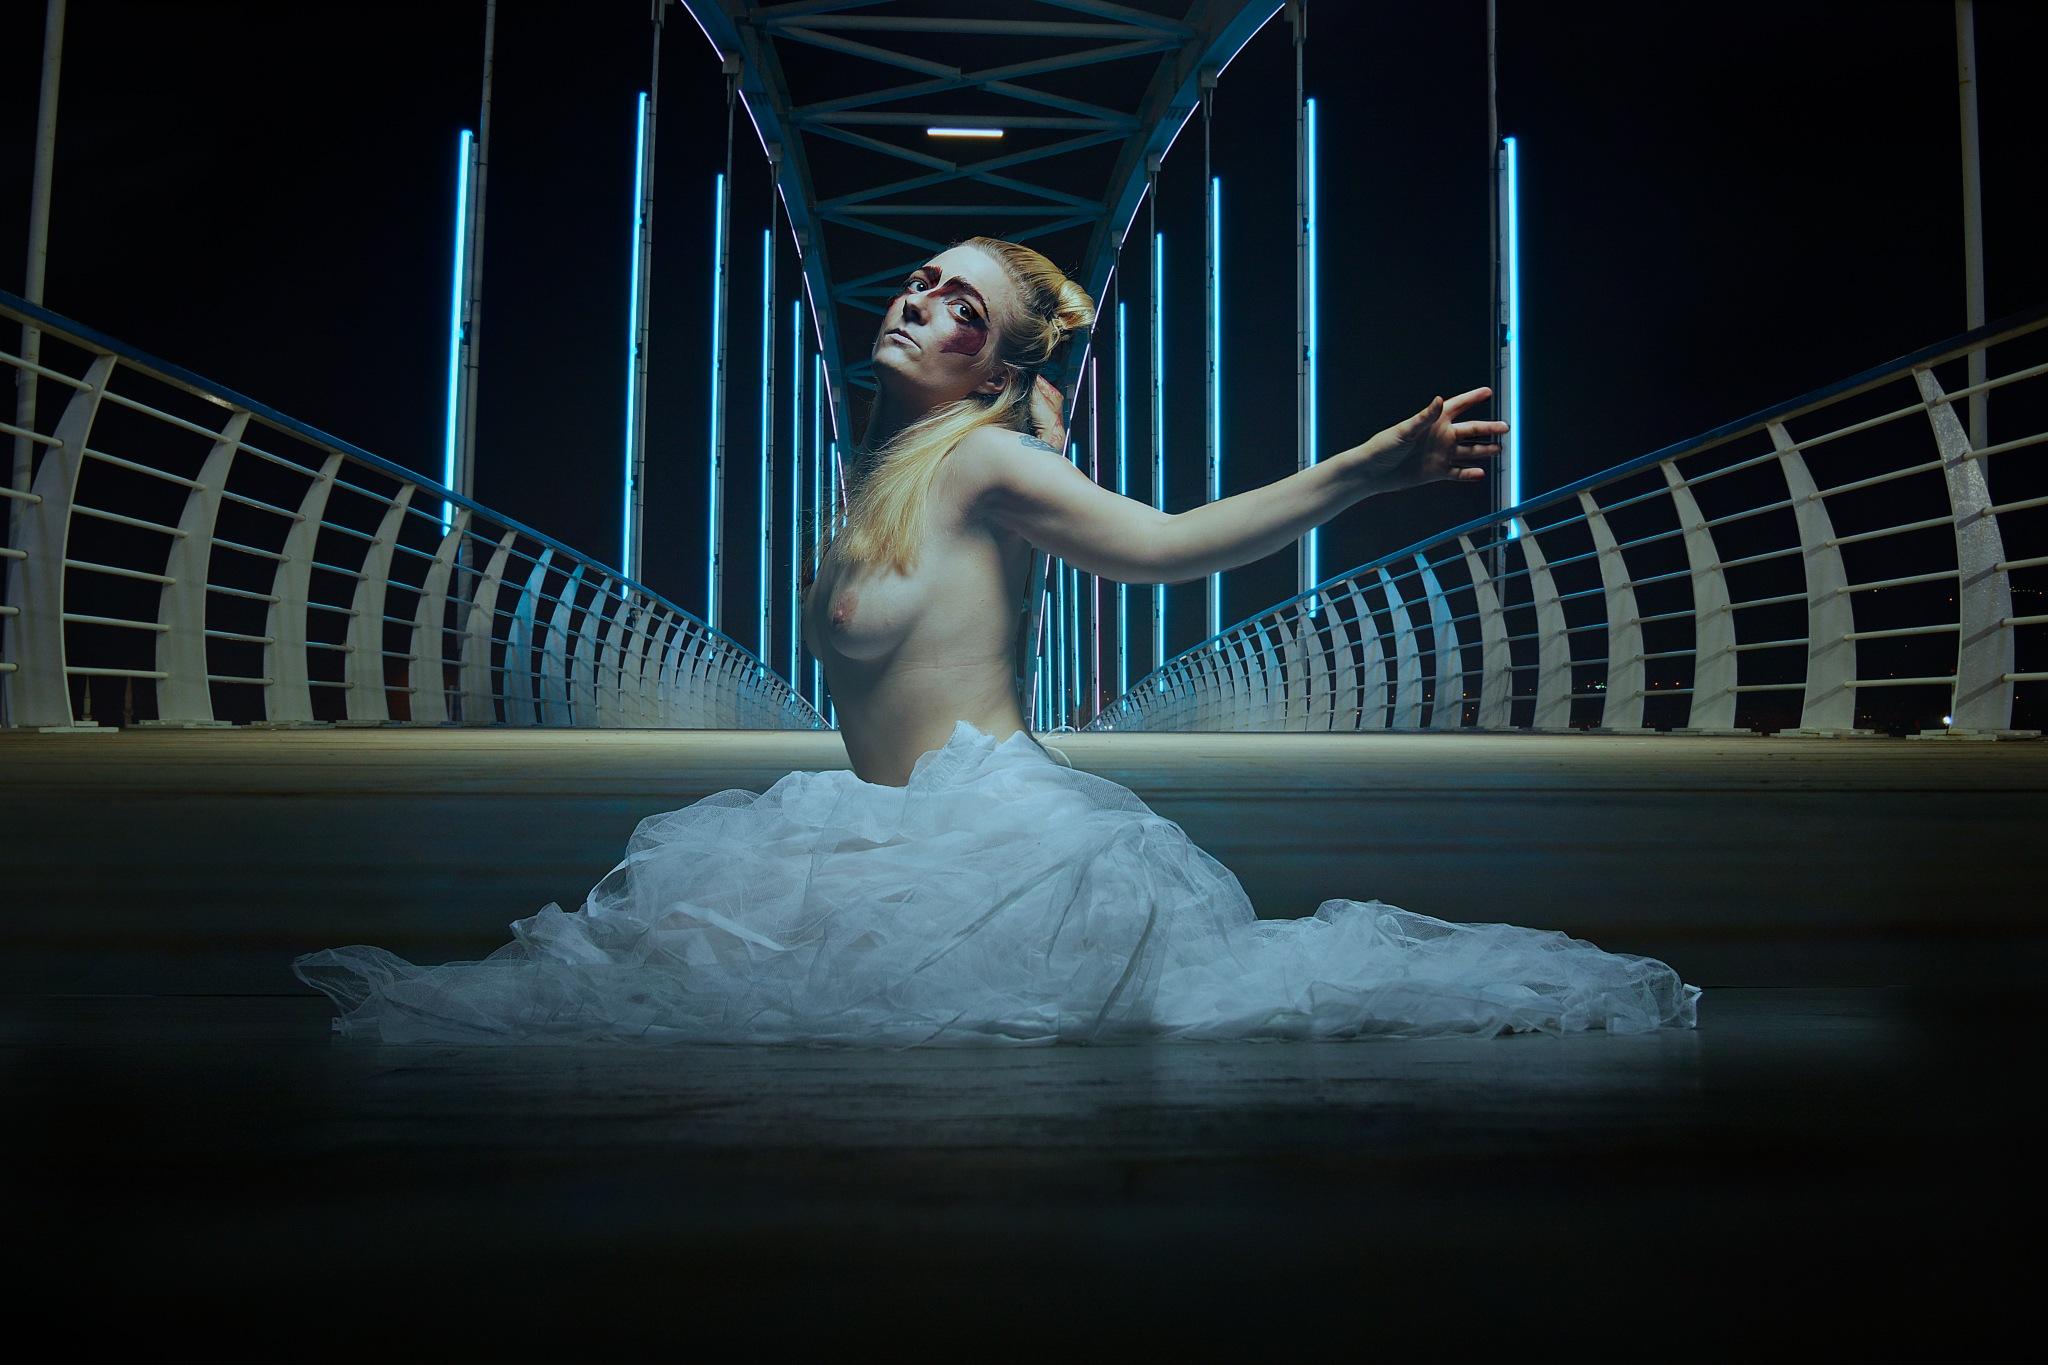 Dancing - 2 - by Wilfried Schulze